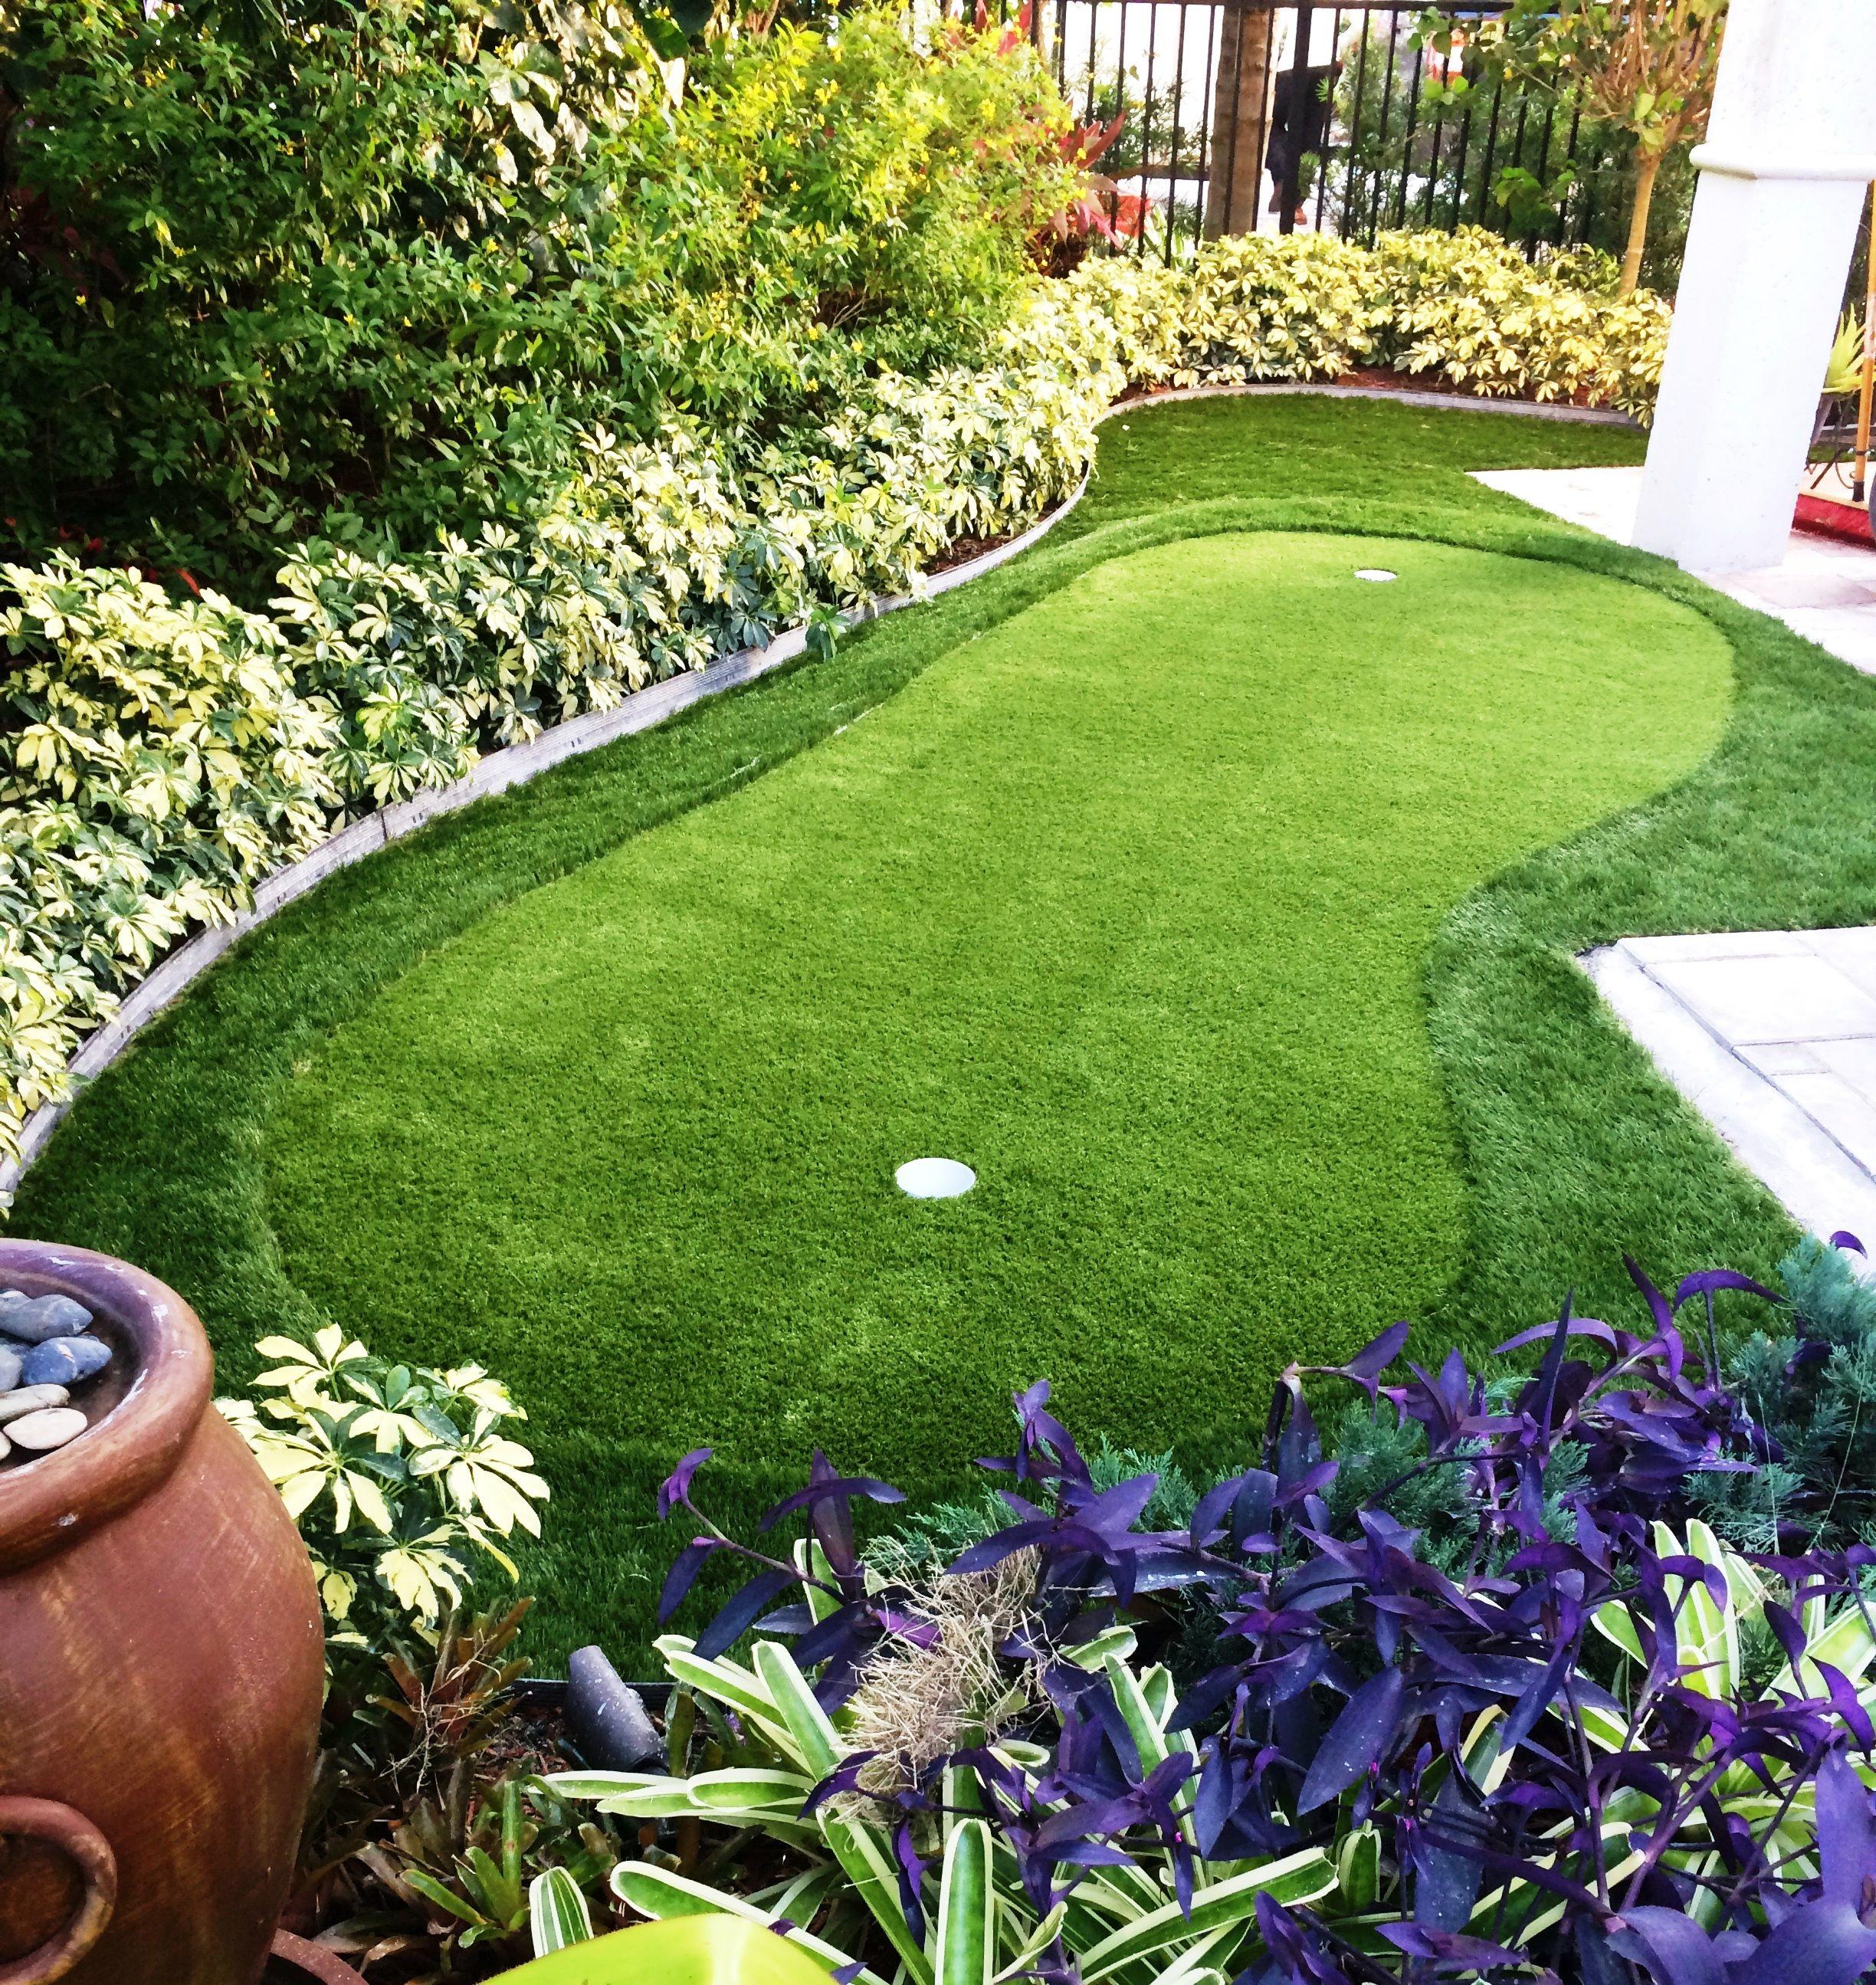 Charming Small Yet Beautiful Backyard Putting Green